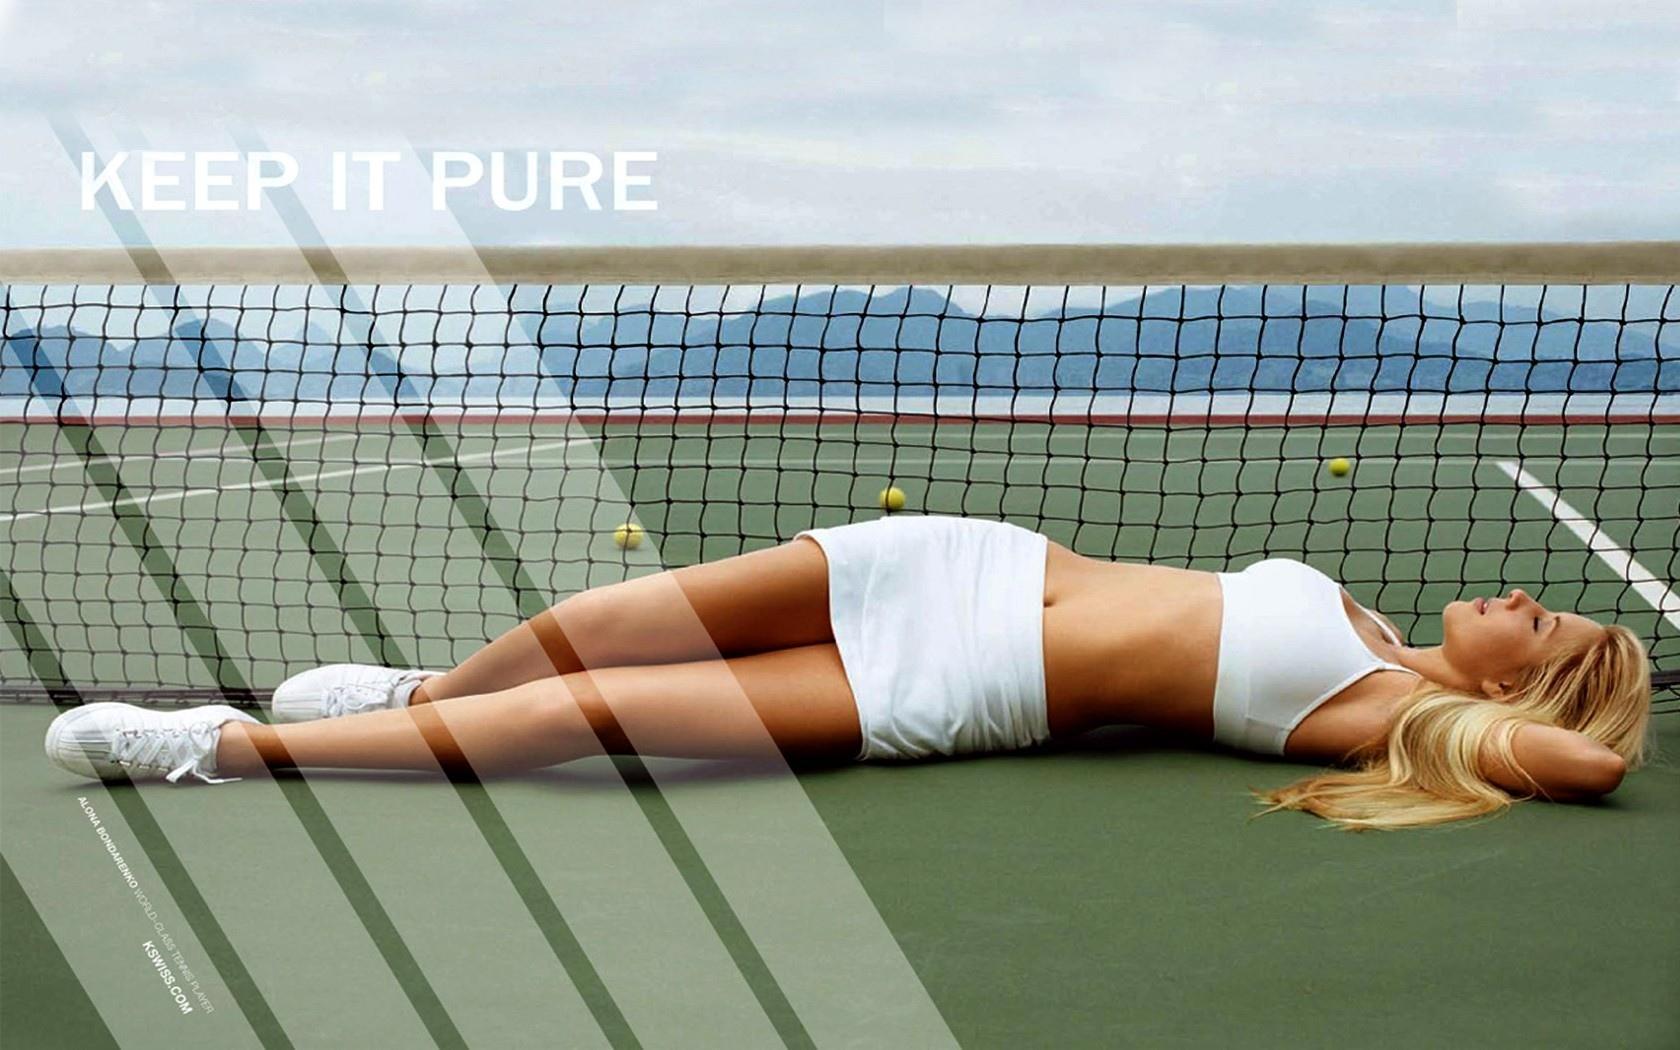 Maria Sharapova Wallpaper Hd Download